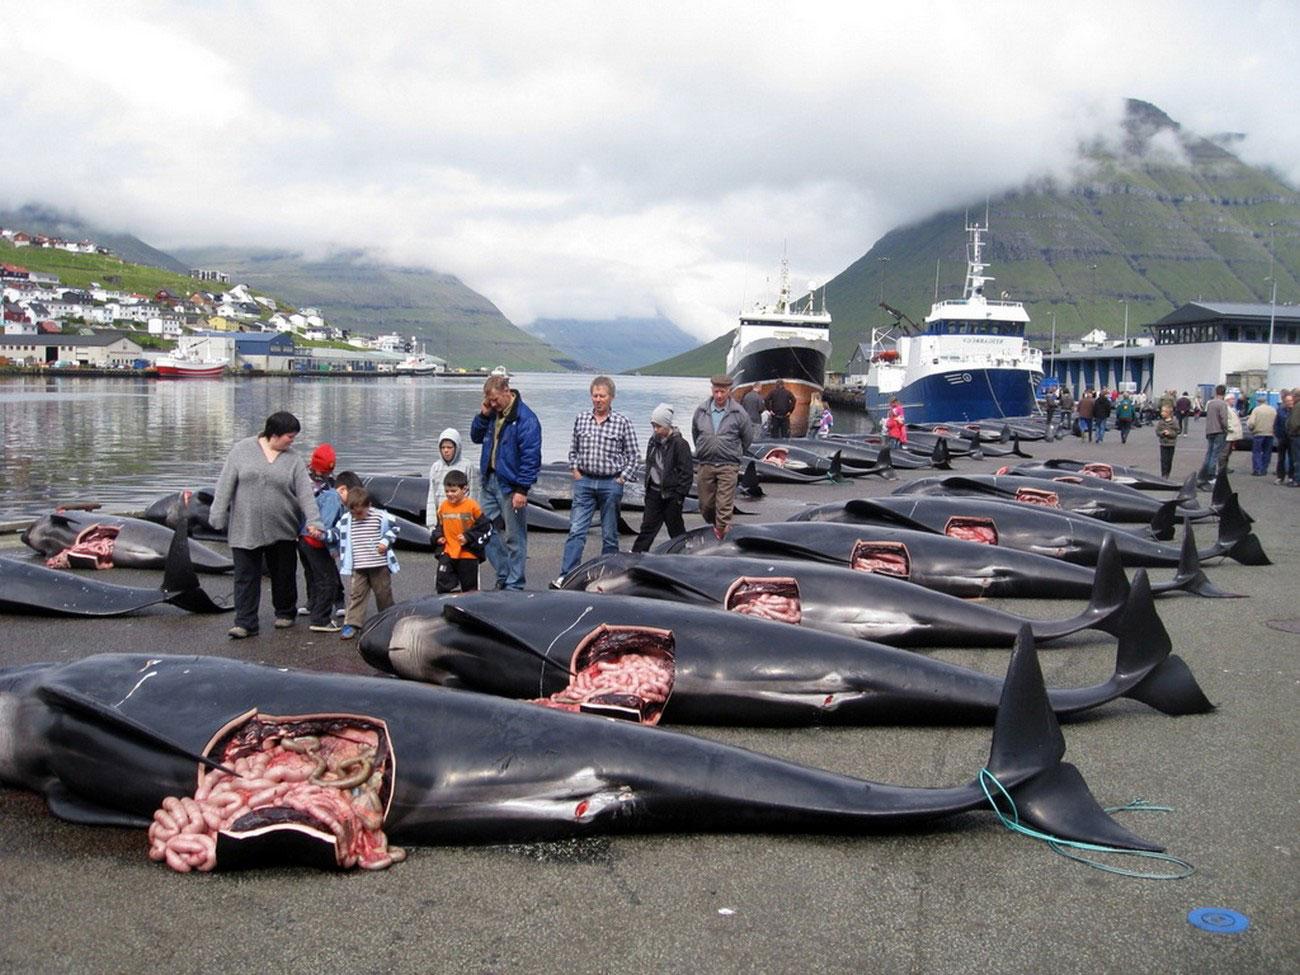 убиство животных на архипелаге